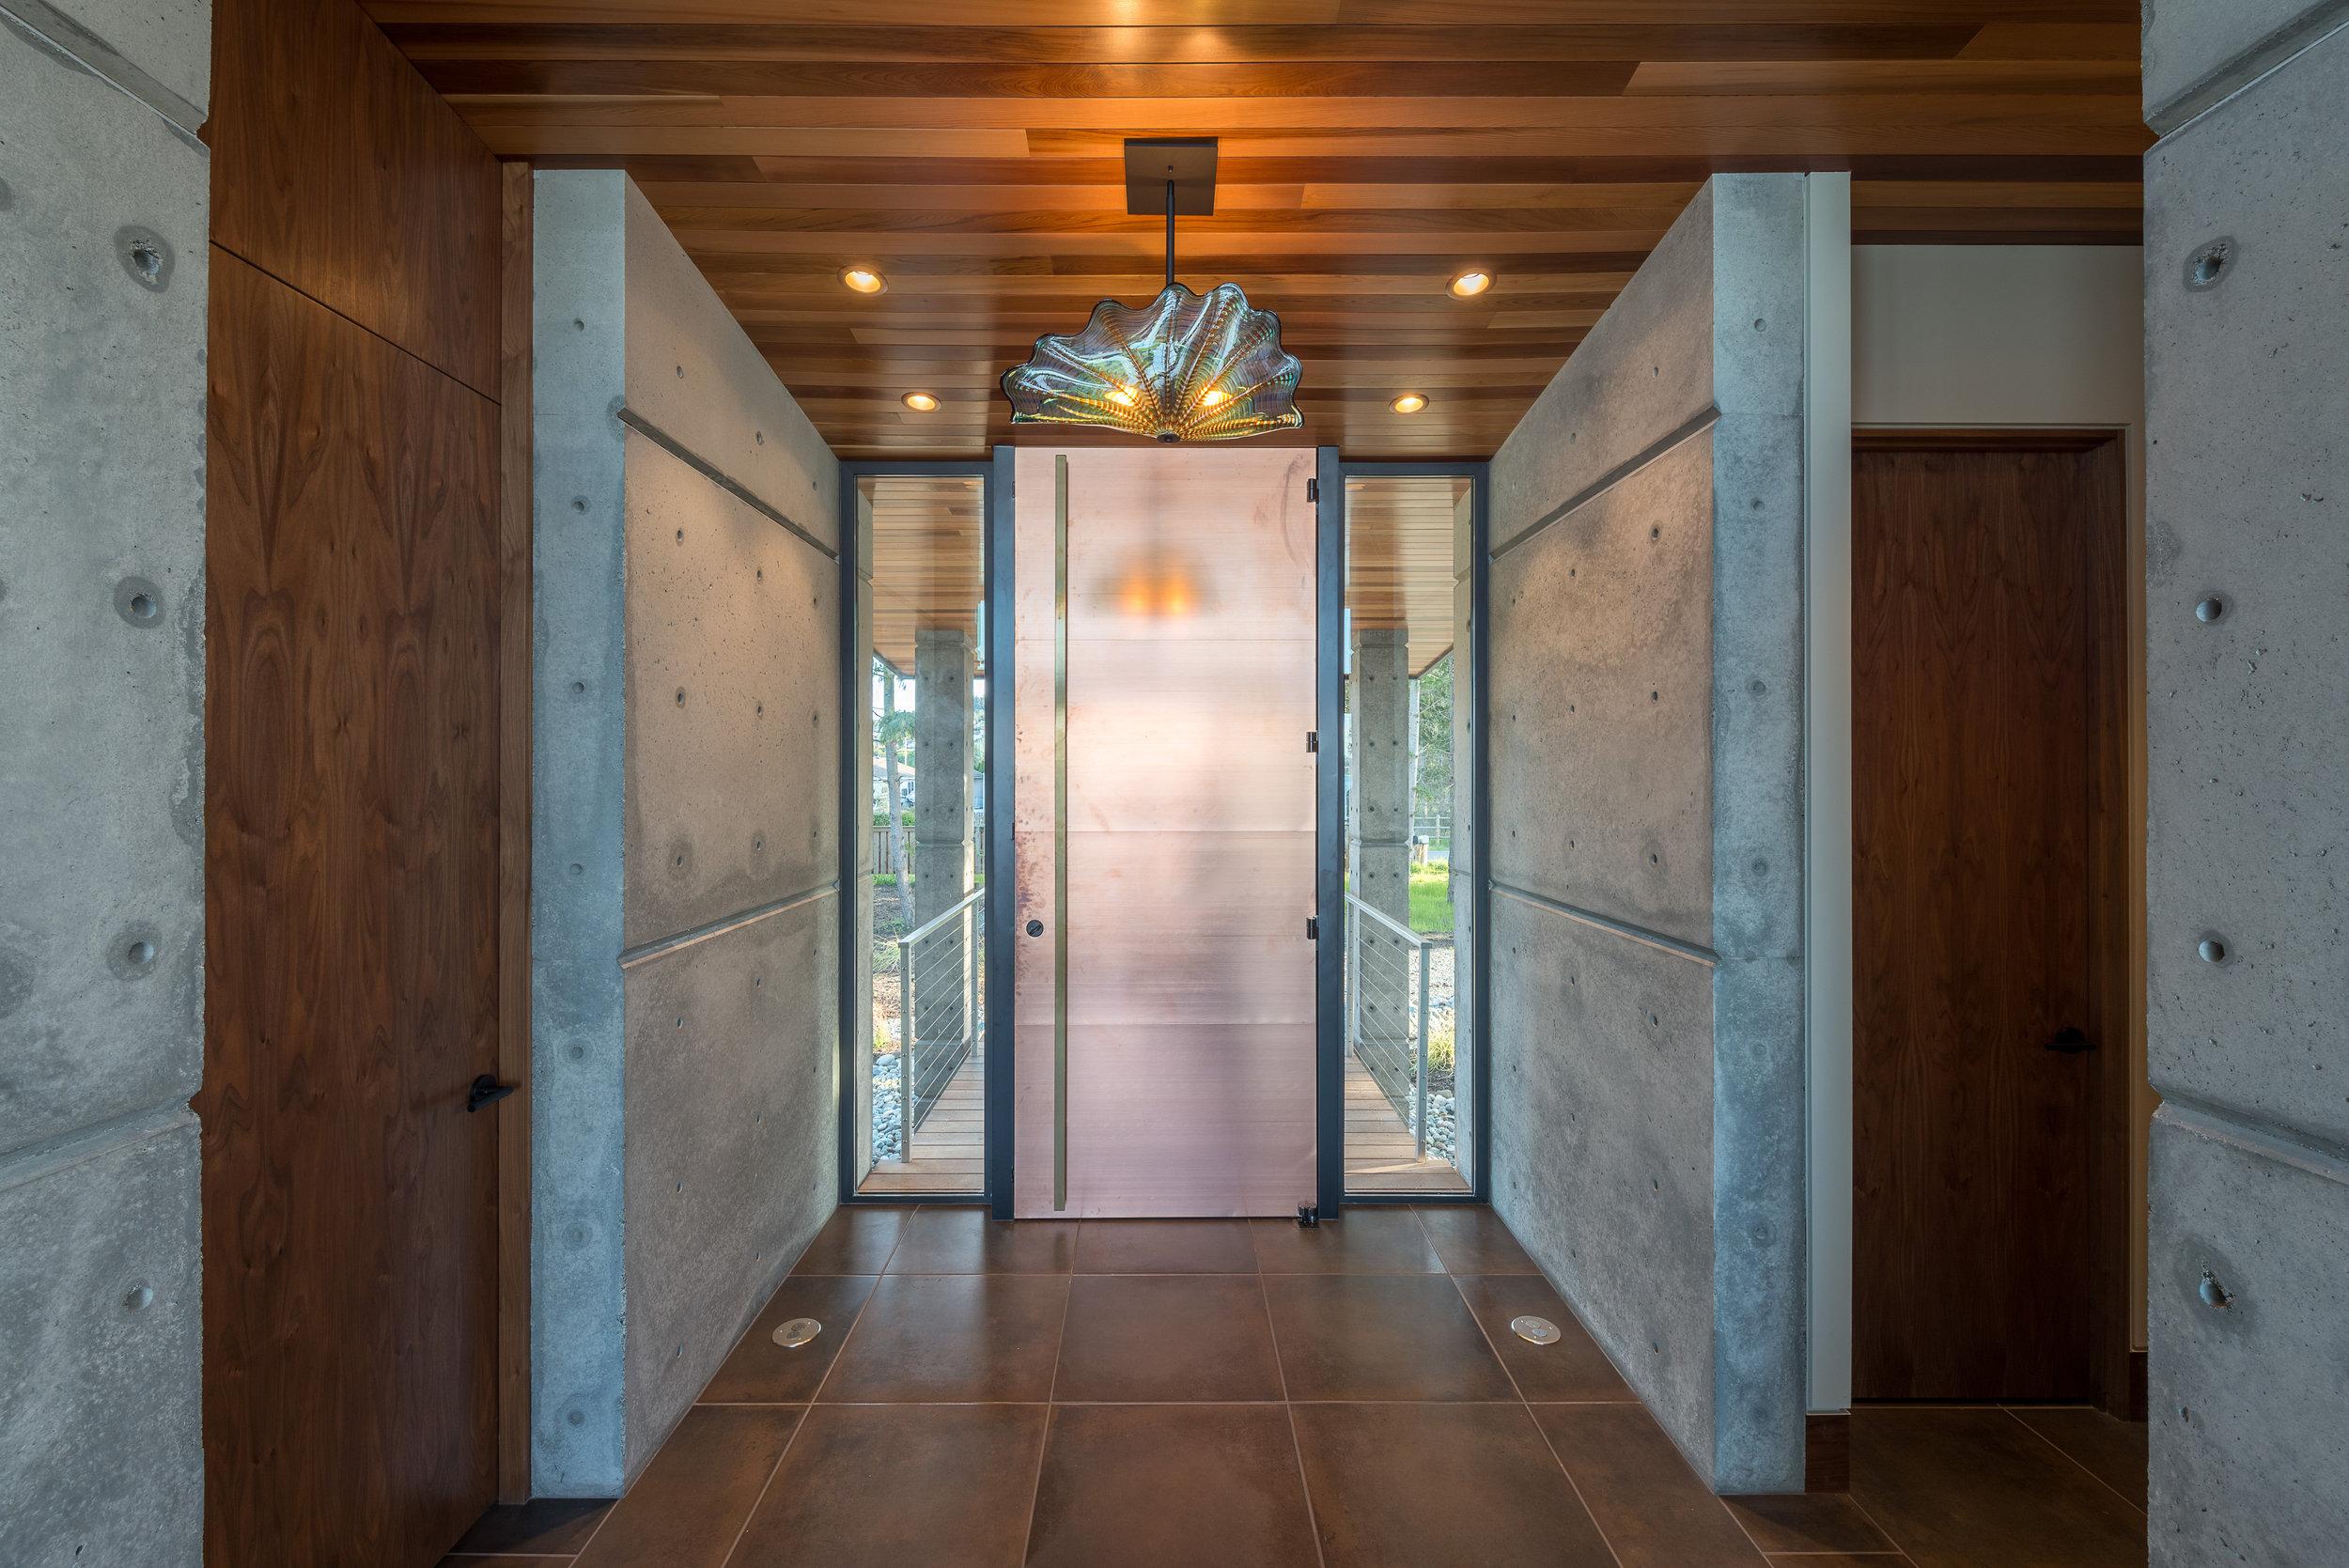 08 - Camano Beach Drive House 5000px - Swift Studio.jpg